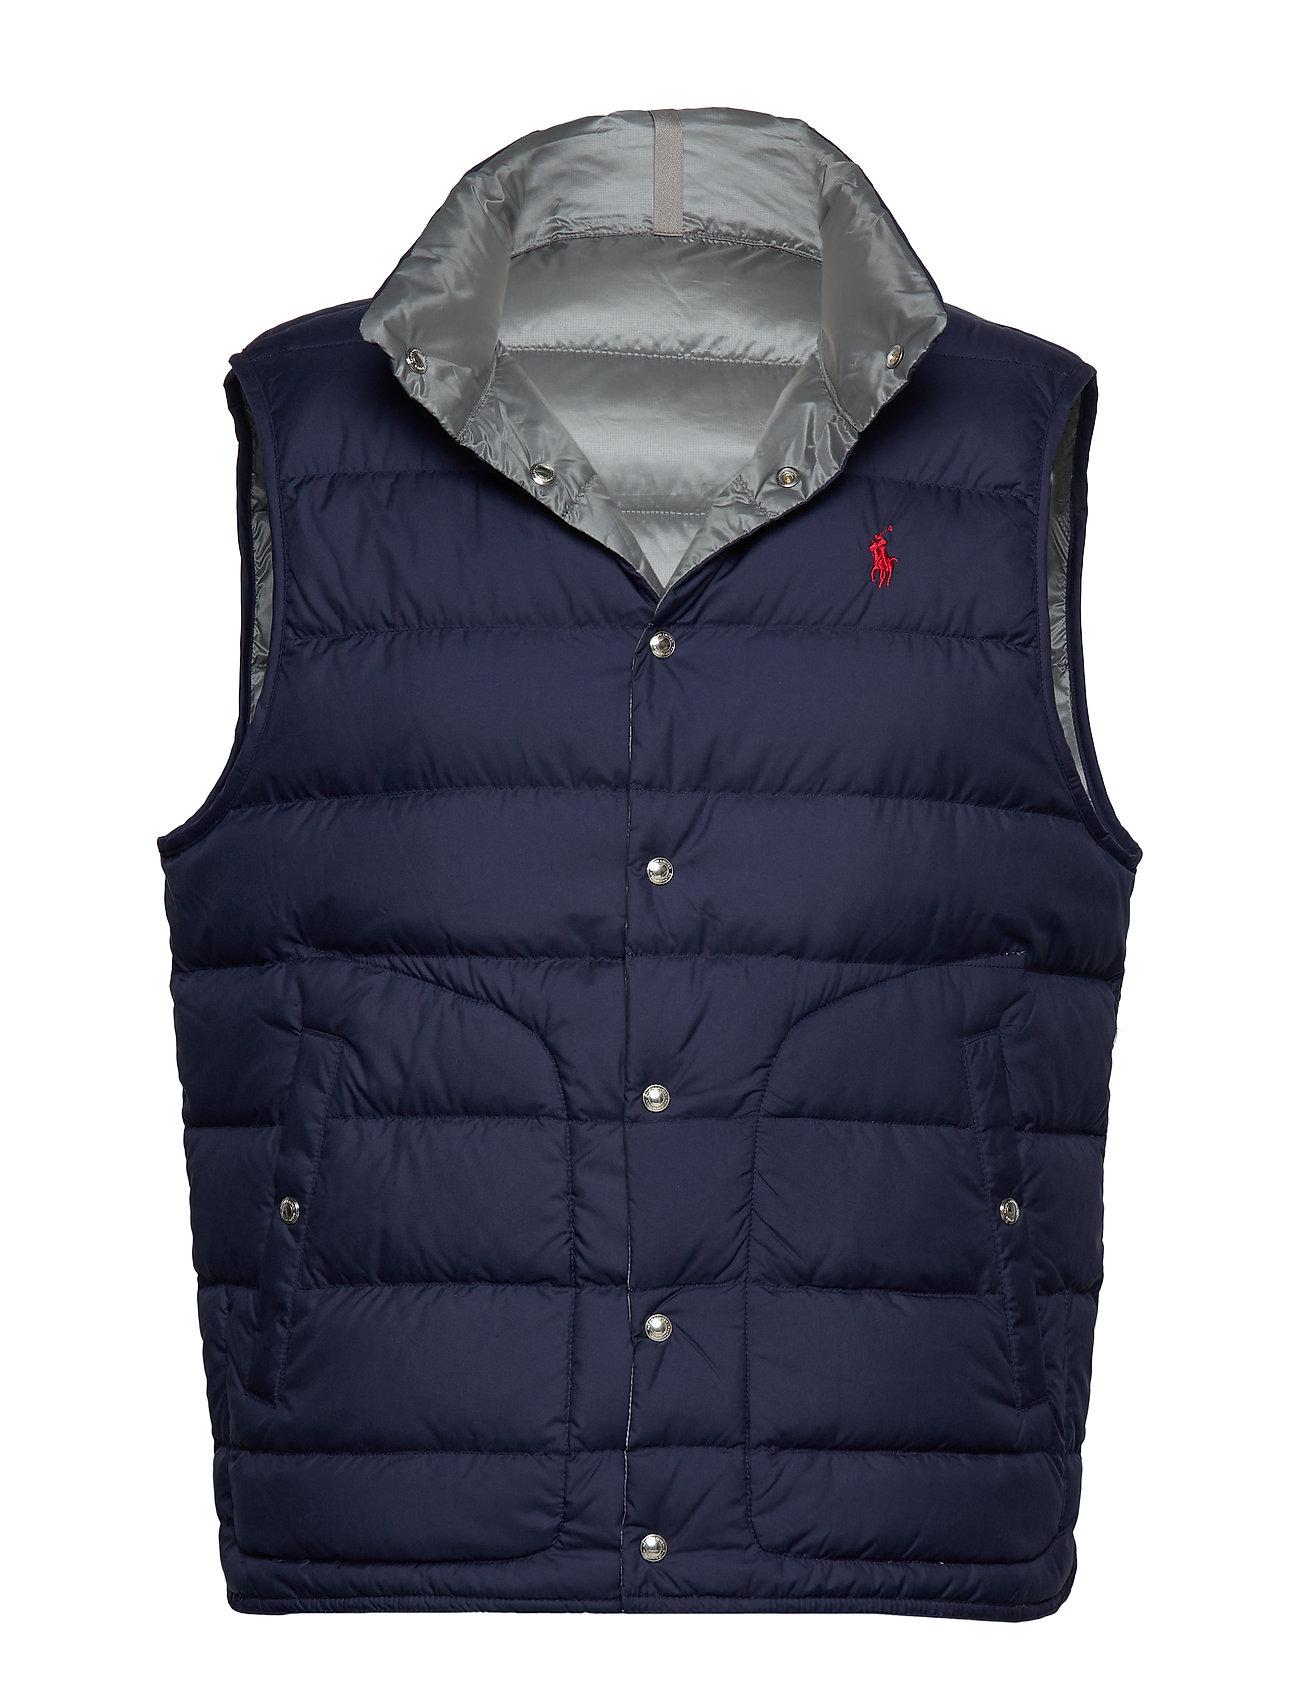 Polo Ralph Lauren Reversible Down Vest - NEWPORT NAVY/ SIL